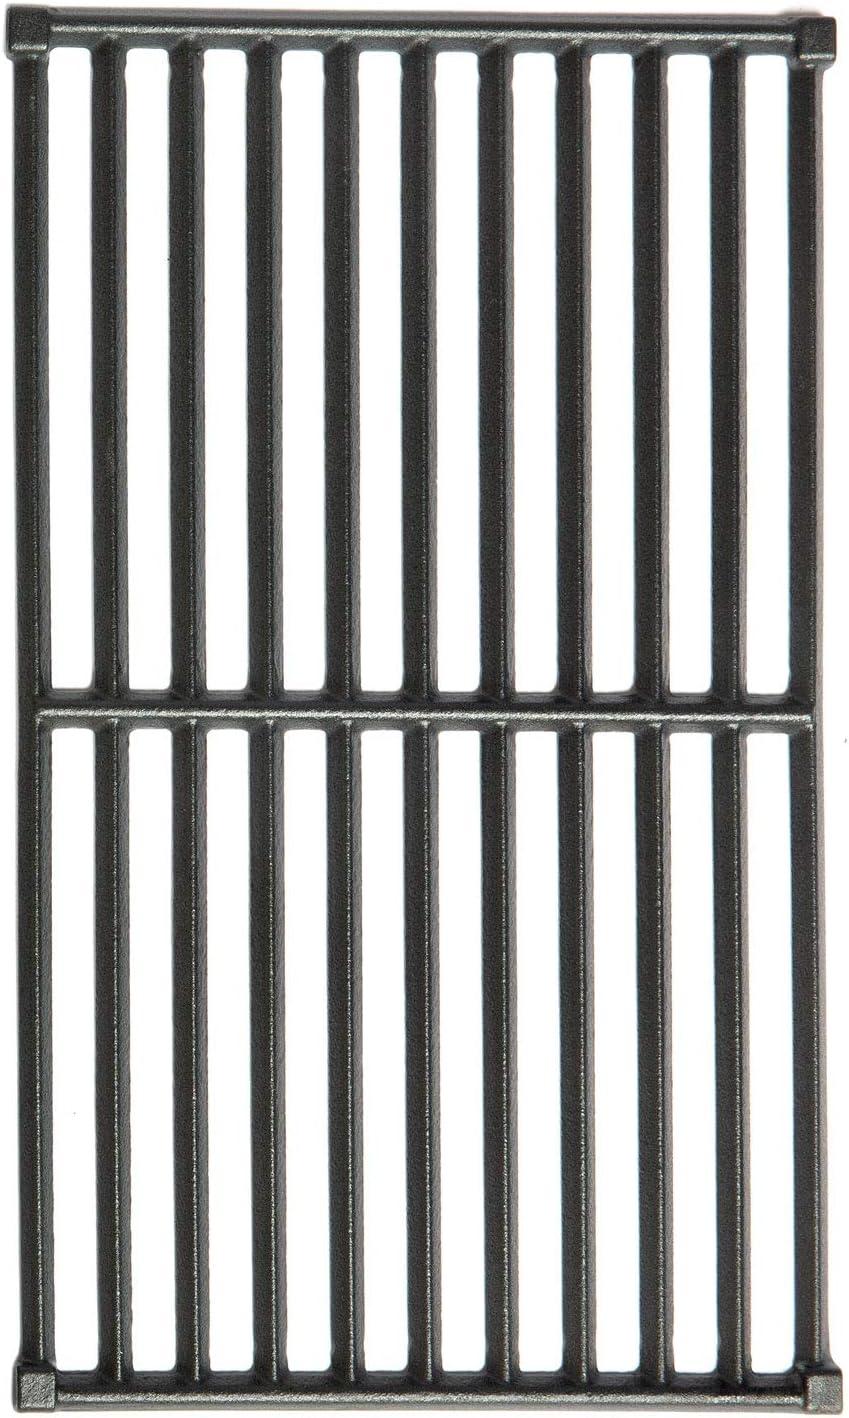 TAINO Platinum//Black 4-//6-Brenner Grillrost Gusseisen Rost Zubeh/ör Gasgrill BBQ